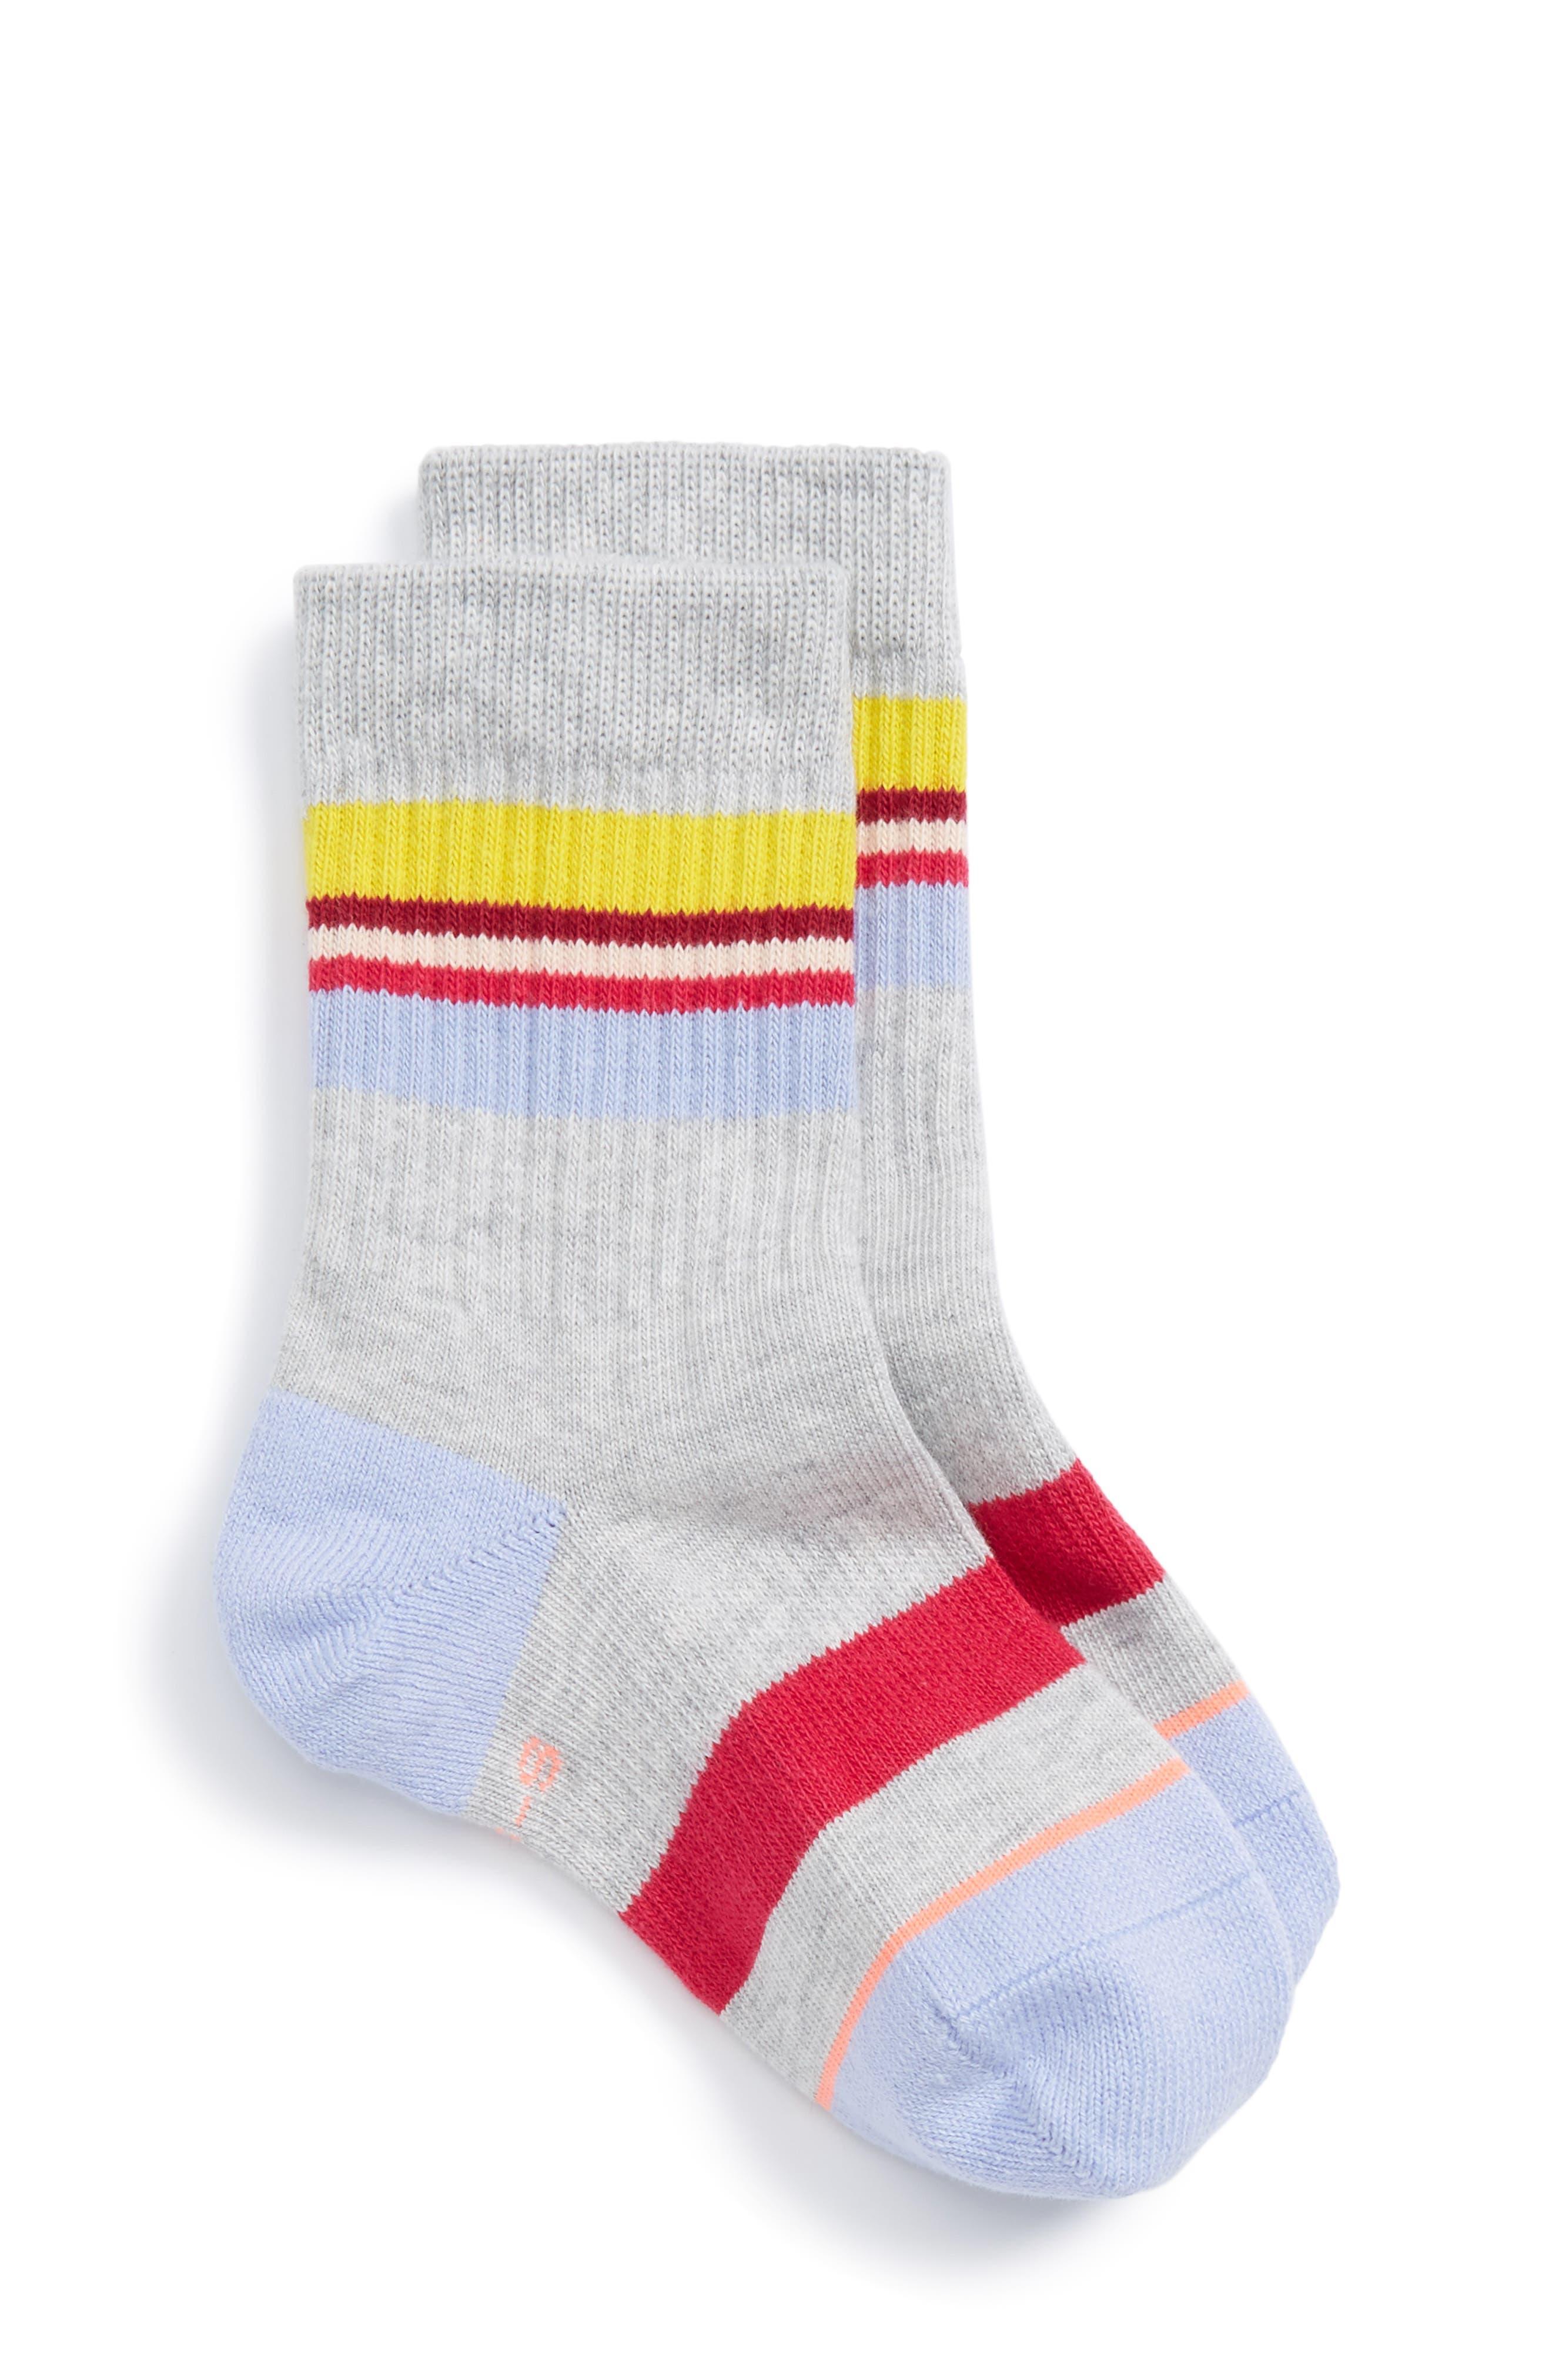 Main Image - Stance Jiggy Striped Socks (Toddler & Little Kid)